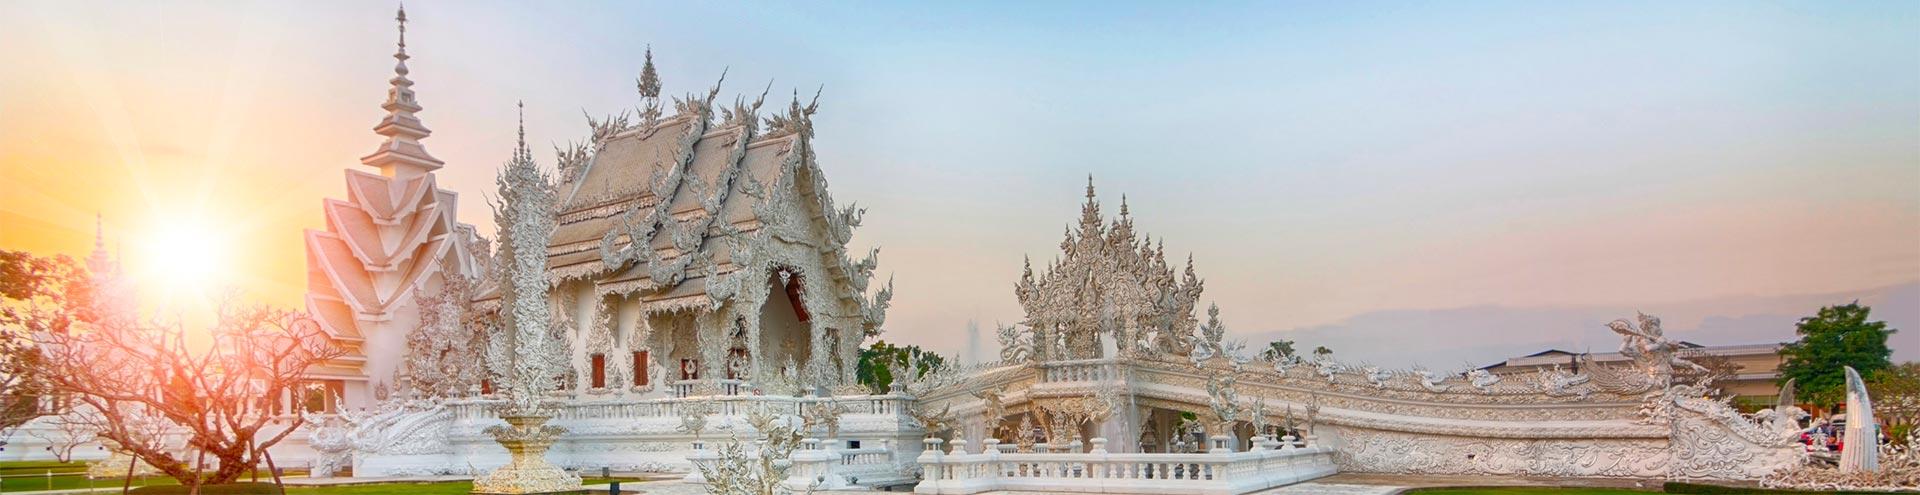 Pacote de Viagem – Chiang Mai e Chiang Rai